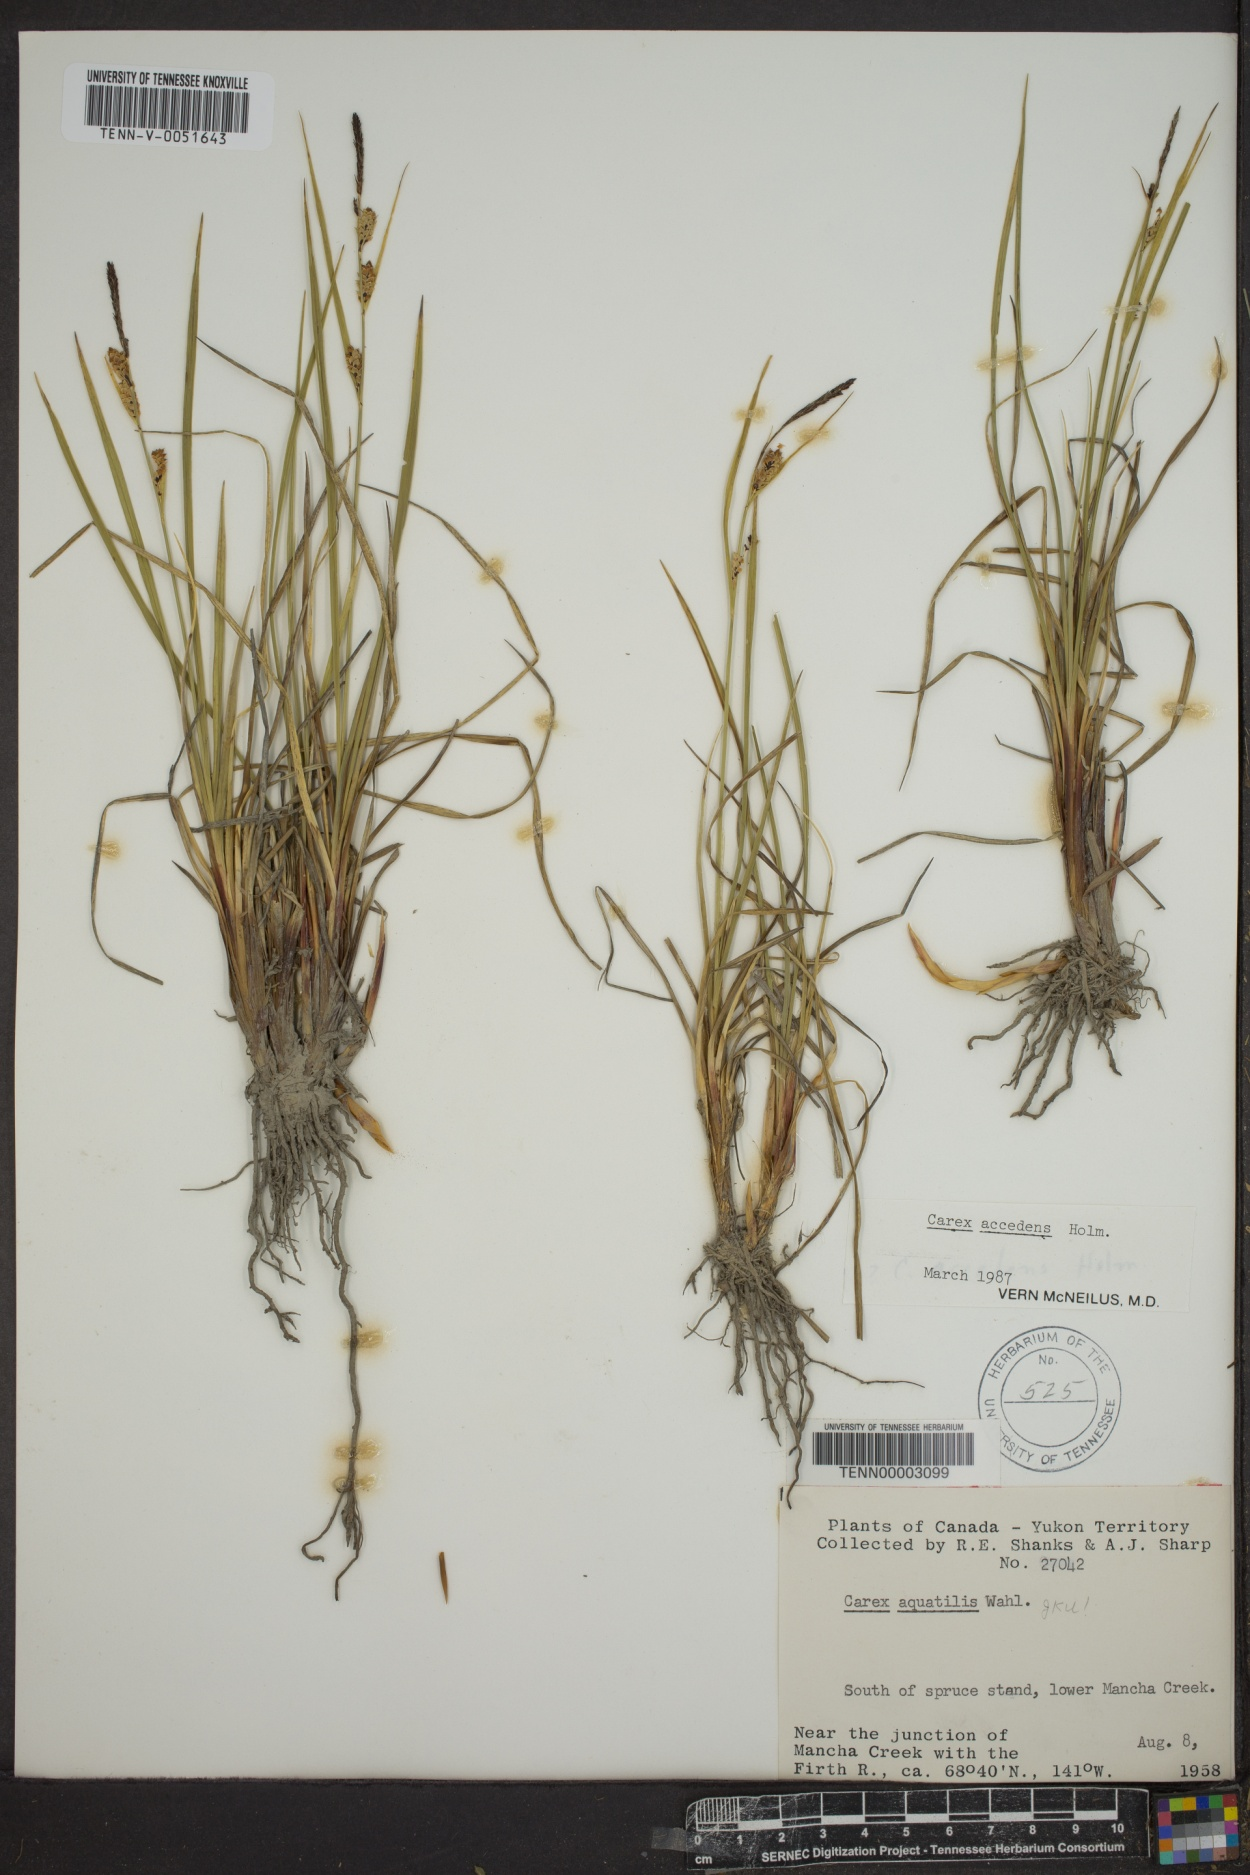 Carex accedens image